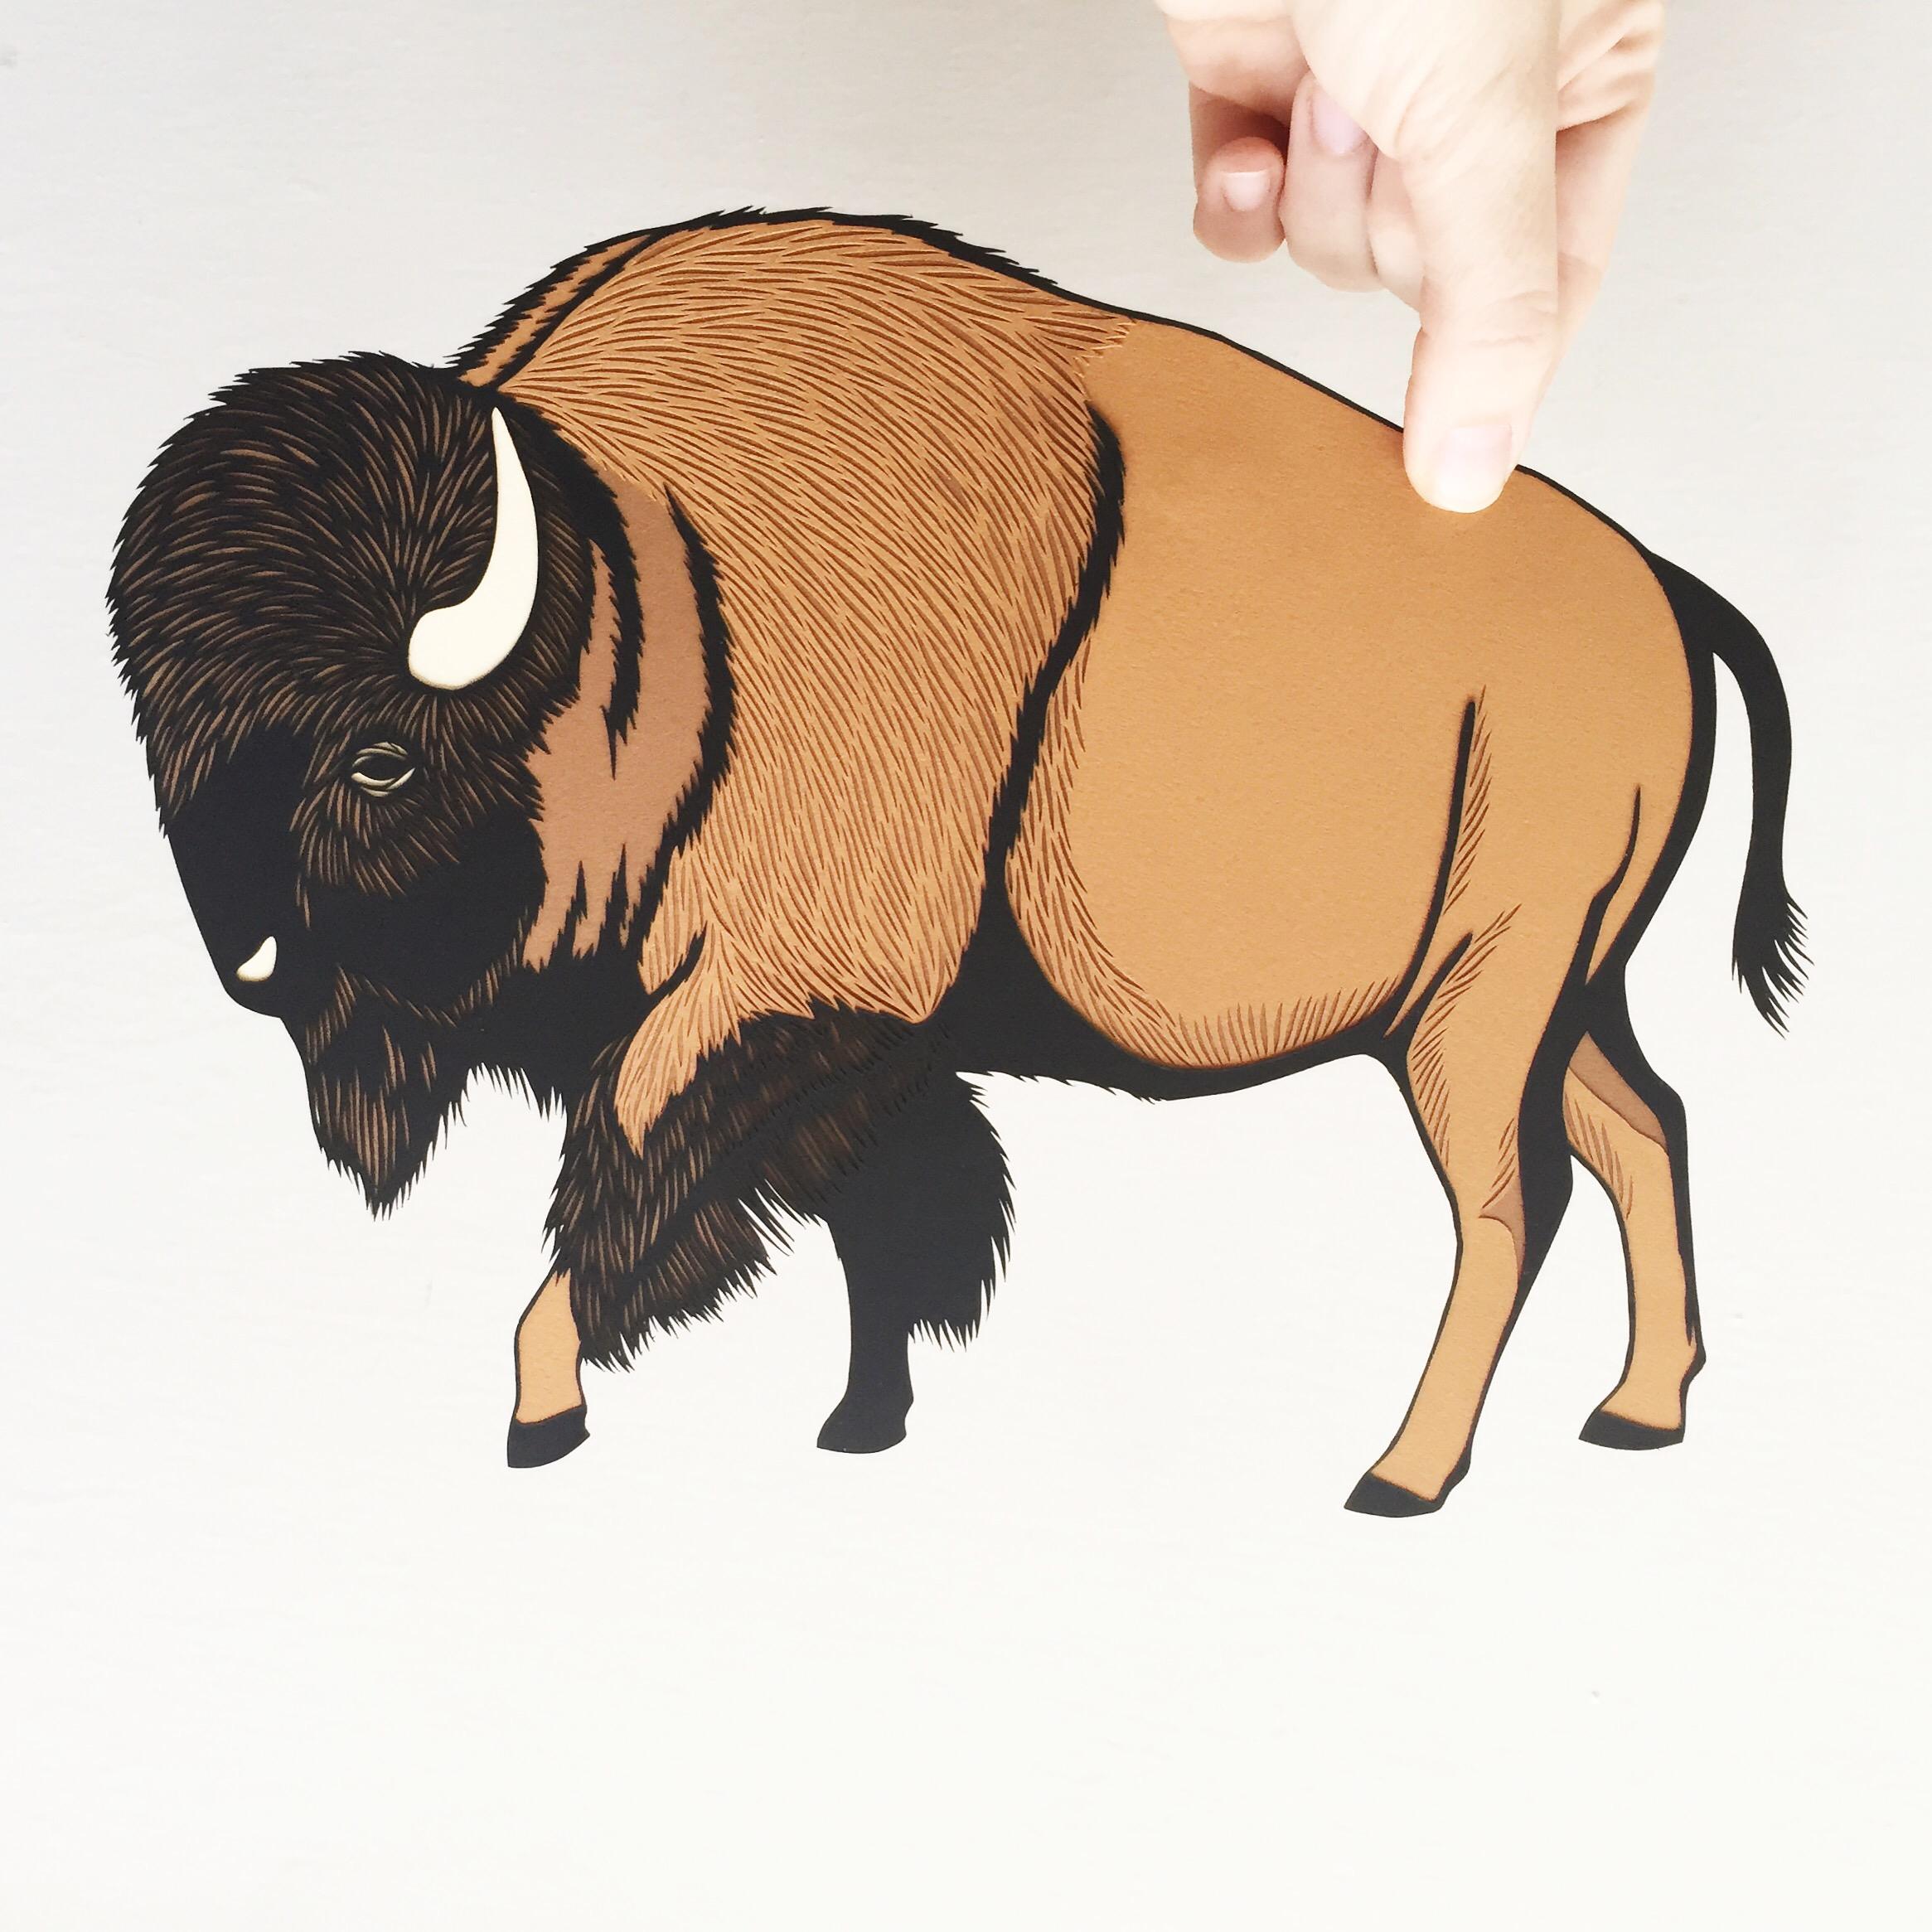 bison: original papercut art by bird mafia artist, emily brown